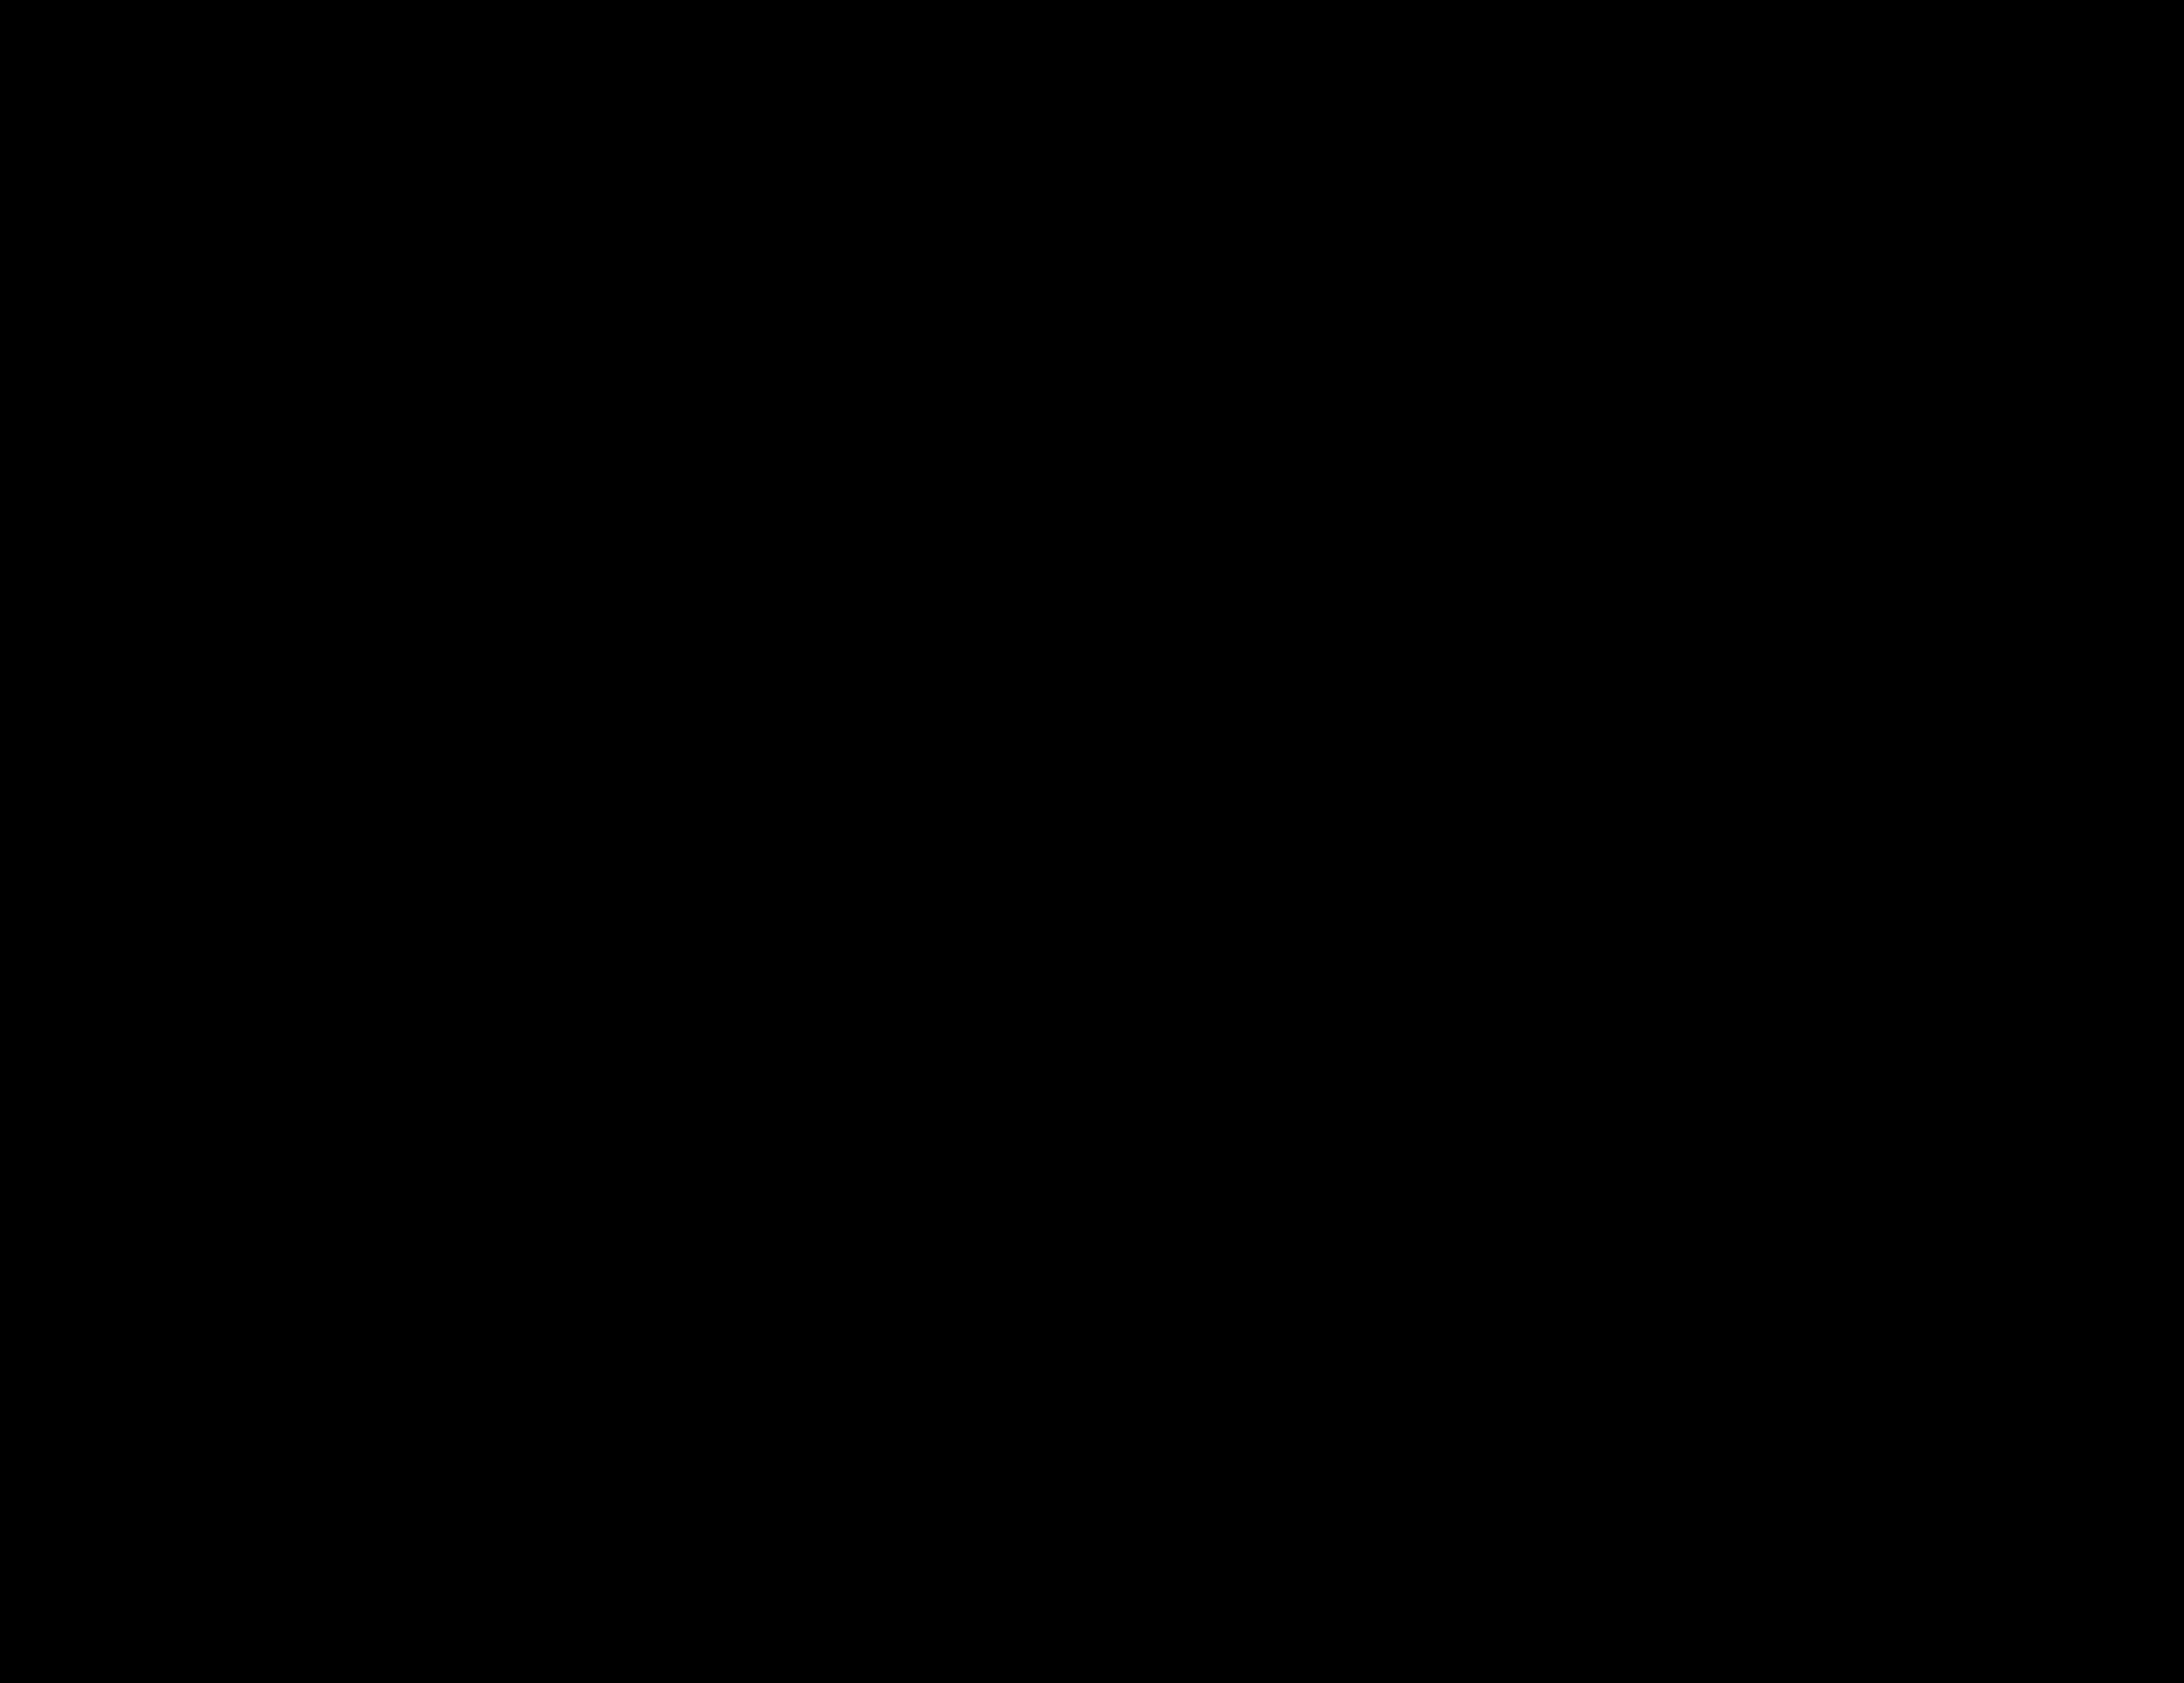 2400x1849 Clipart